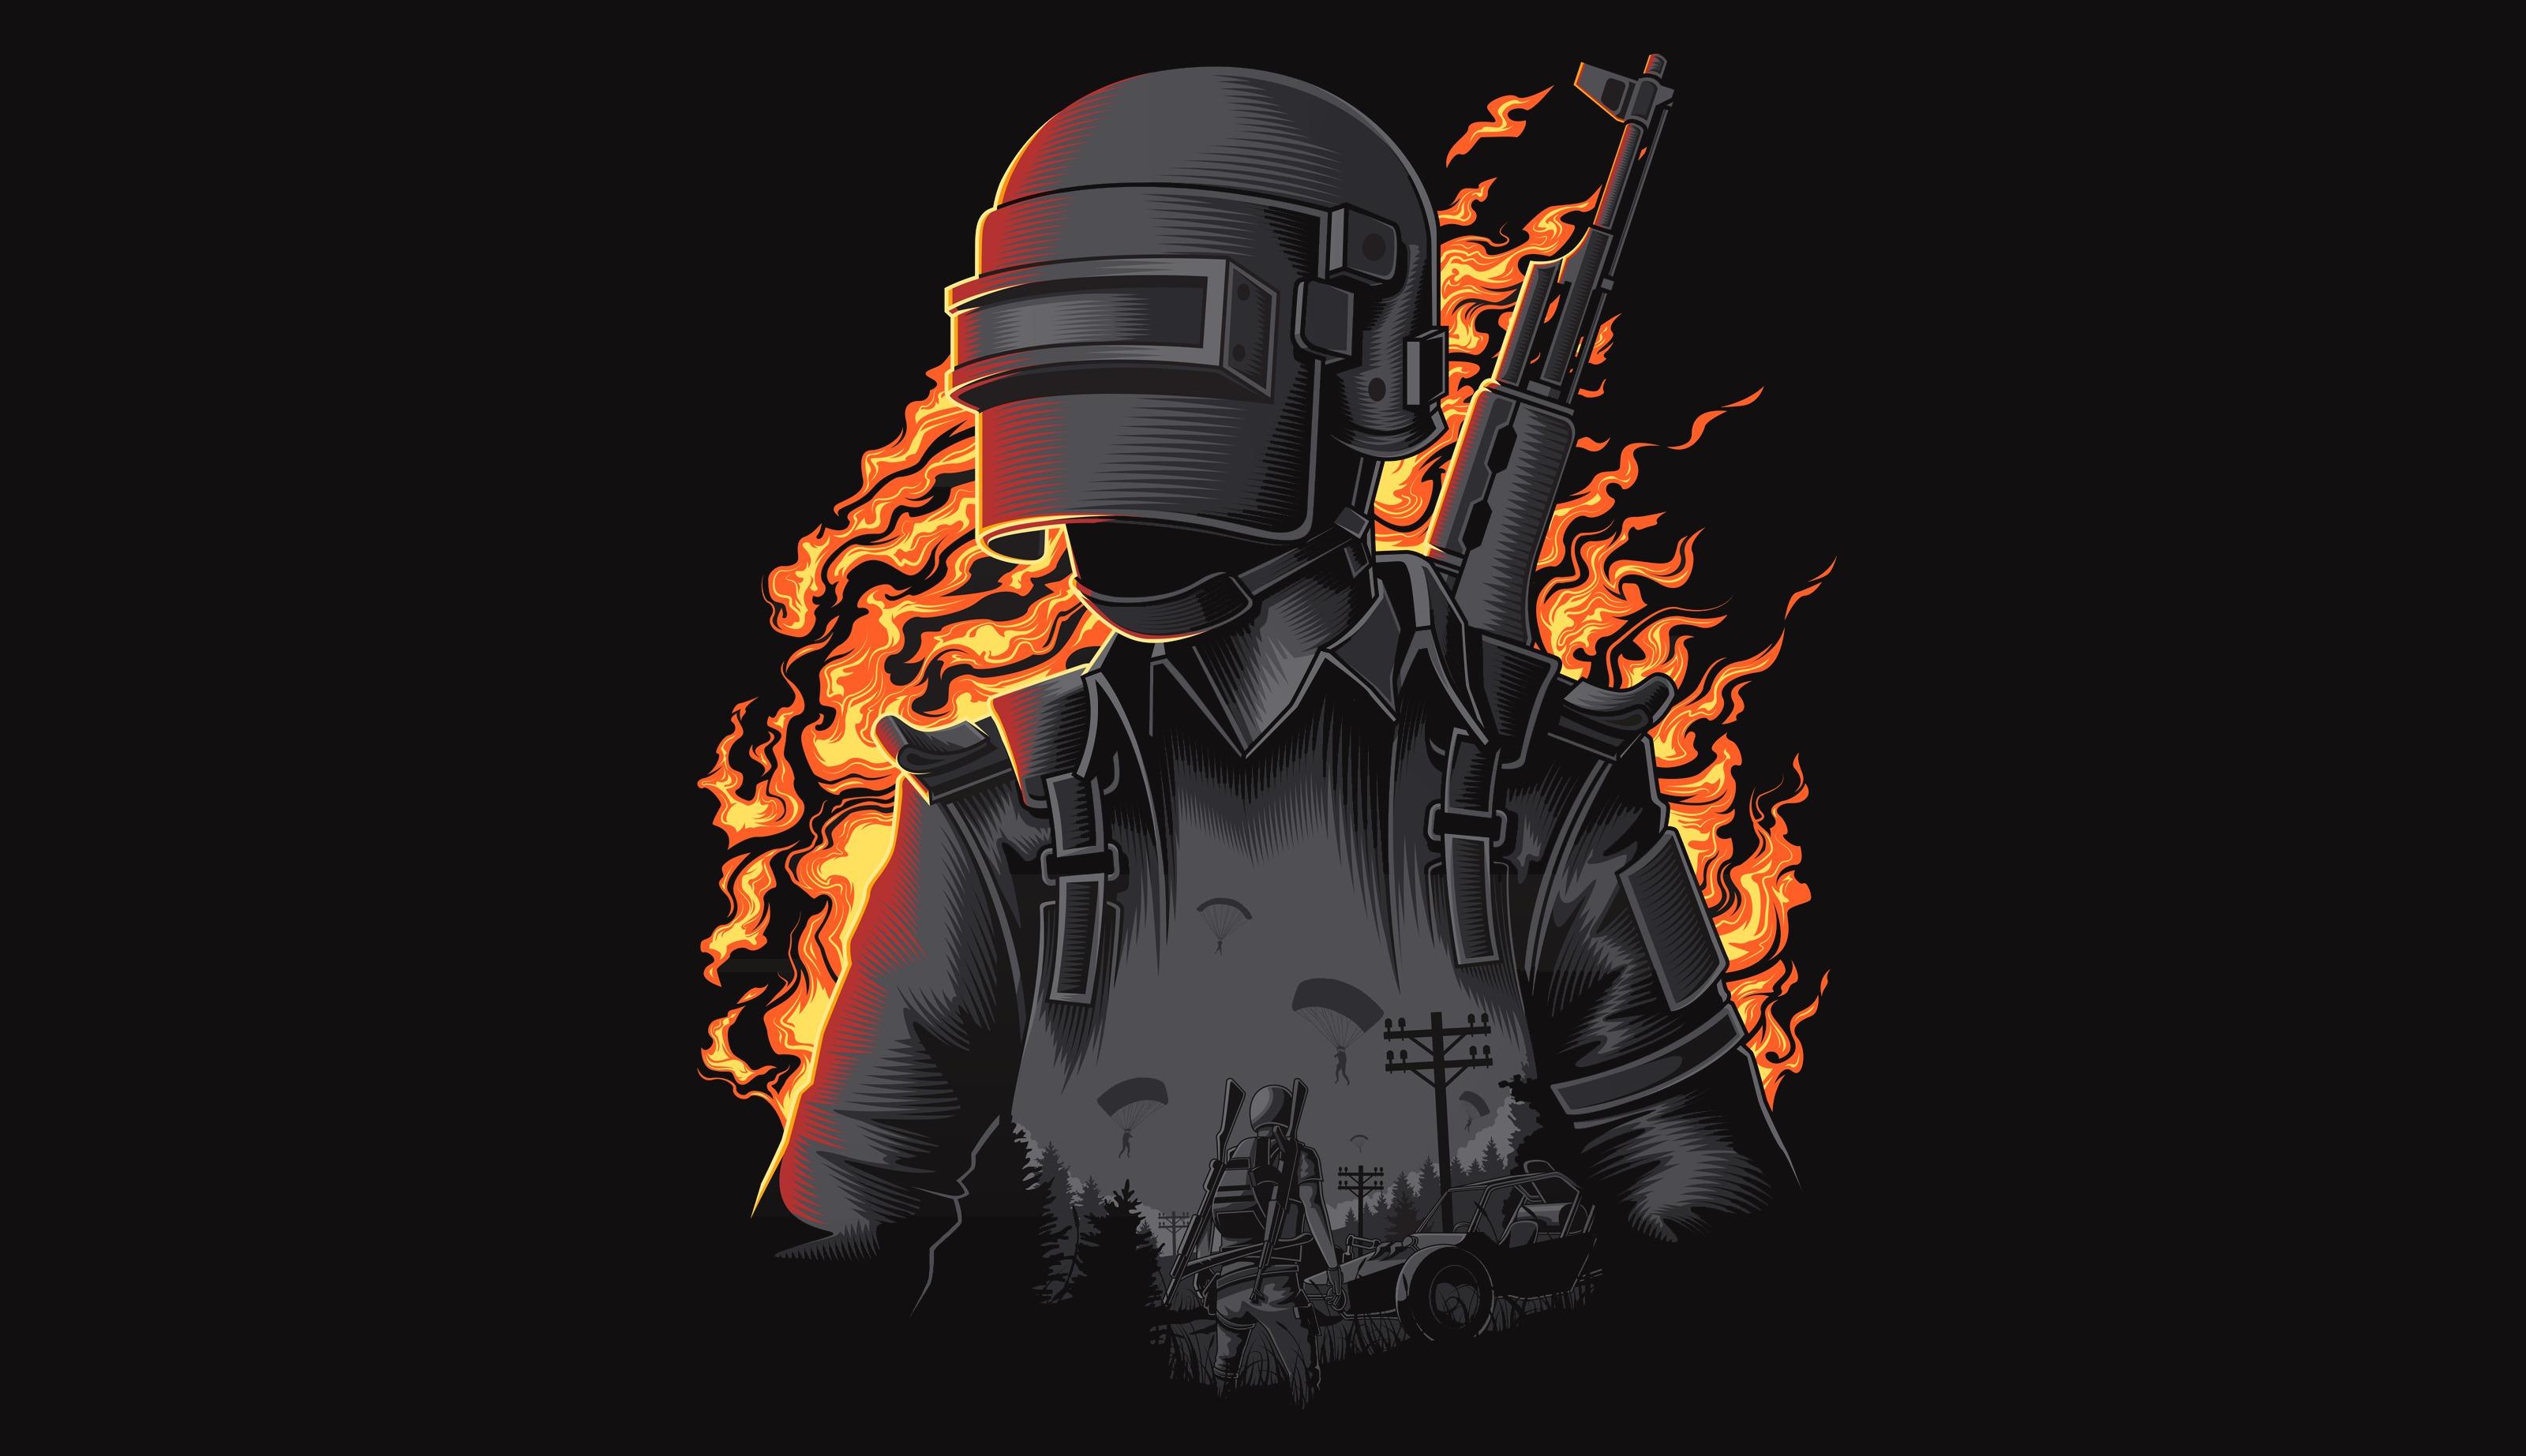 Pubg Fire Illustration Wallpaper Hd Games 4k Wallpapers